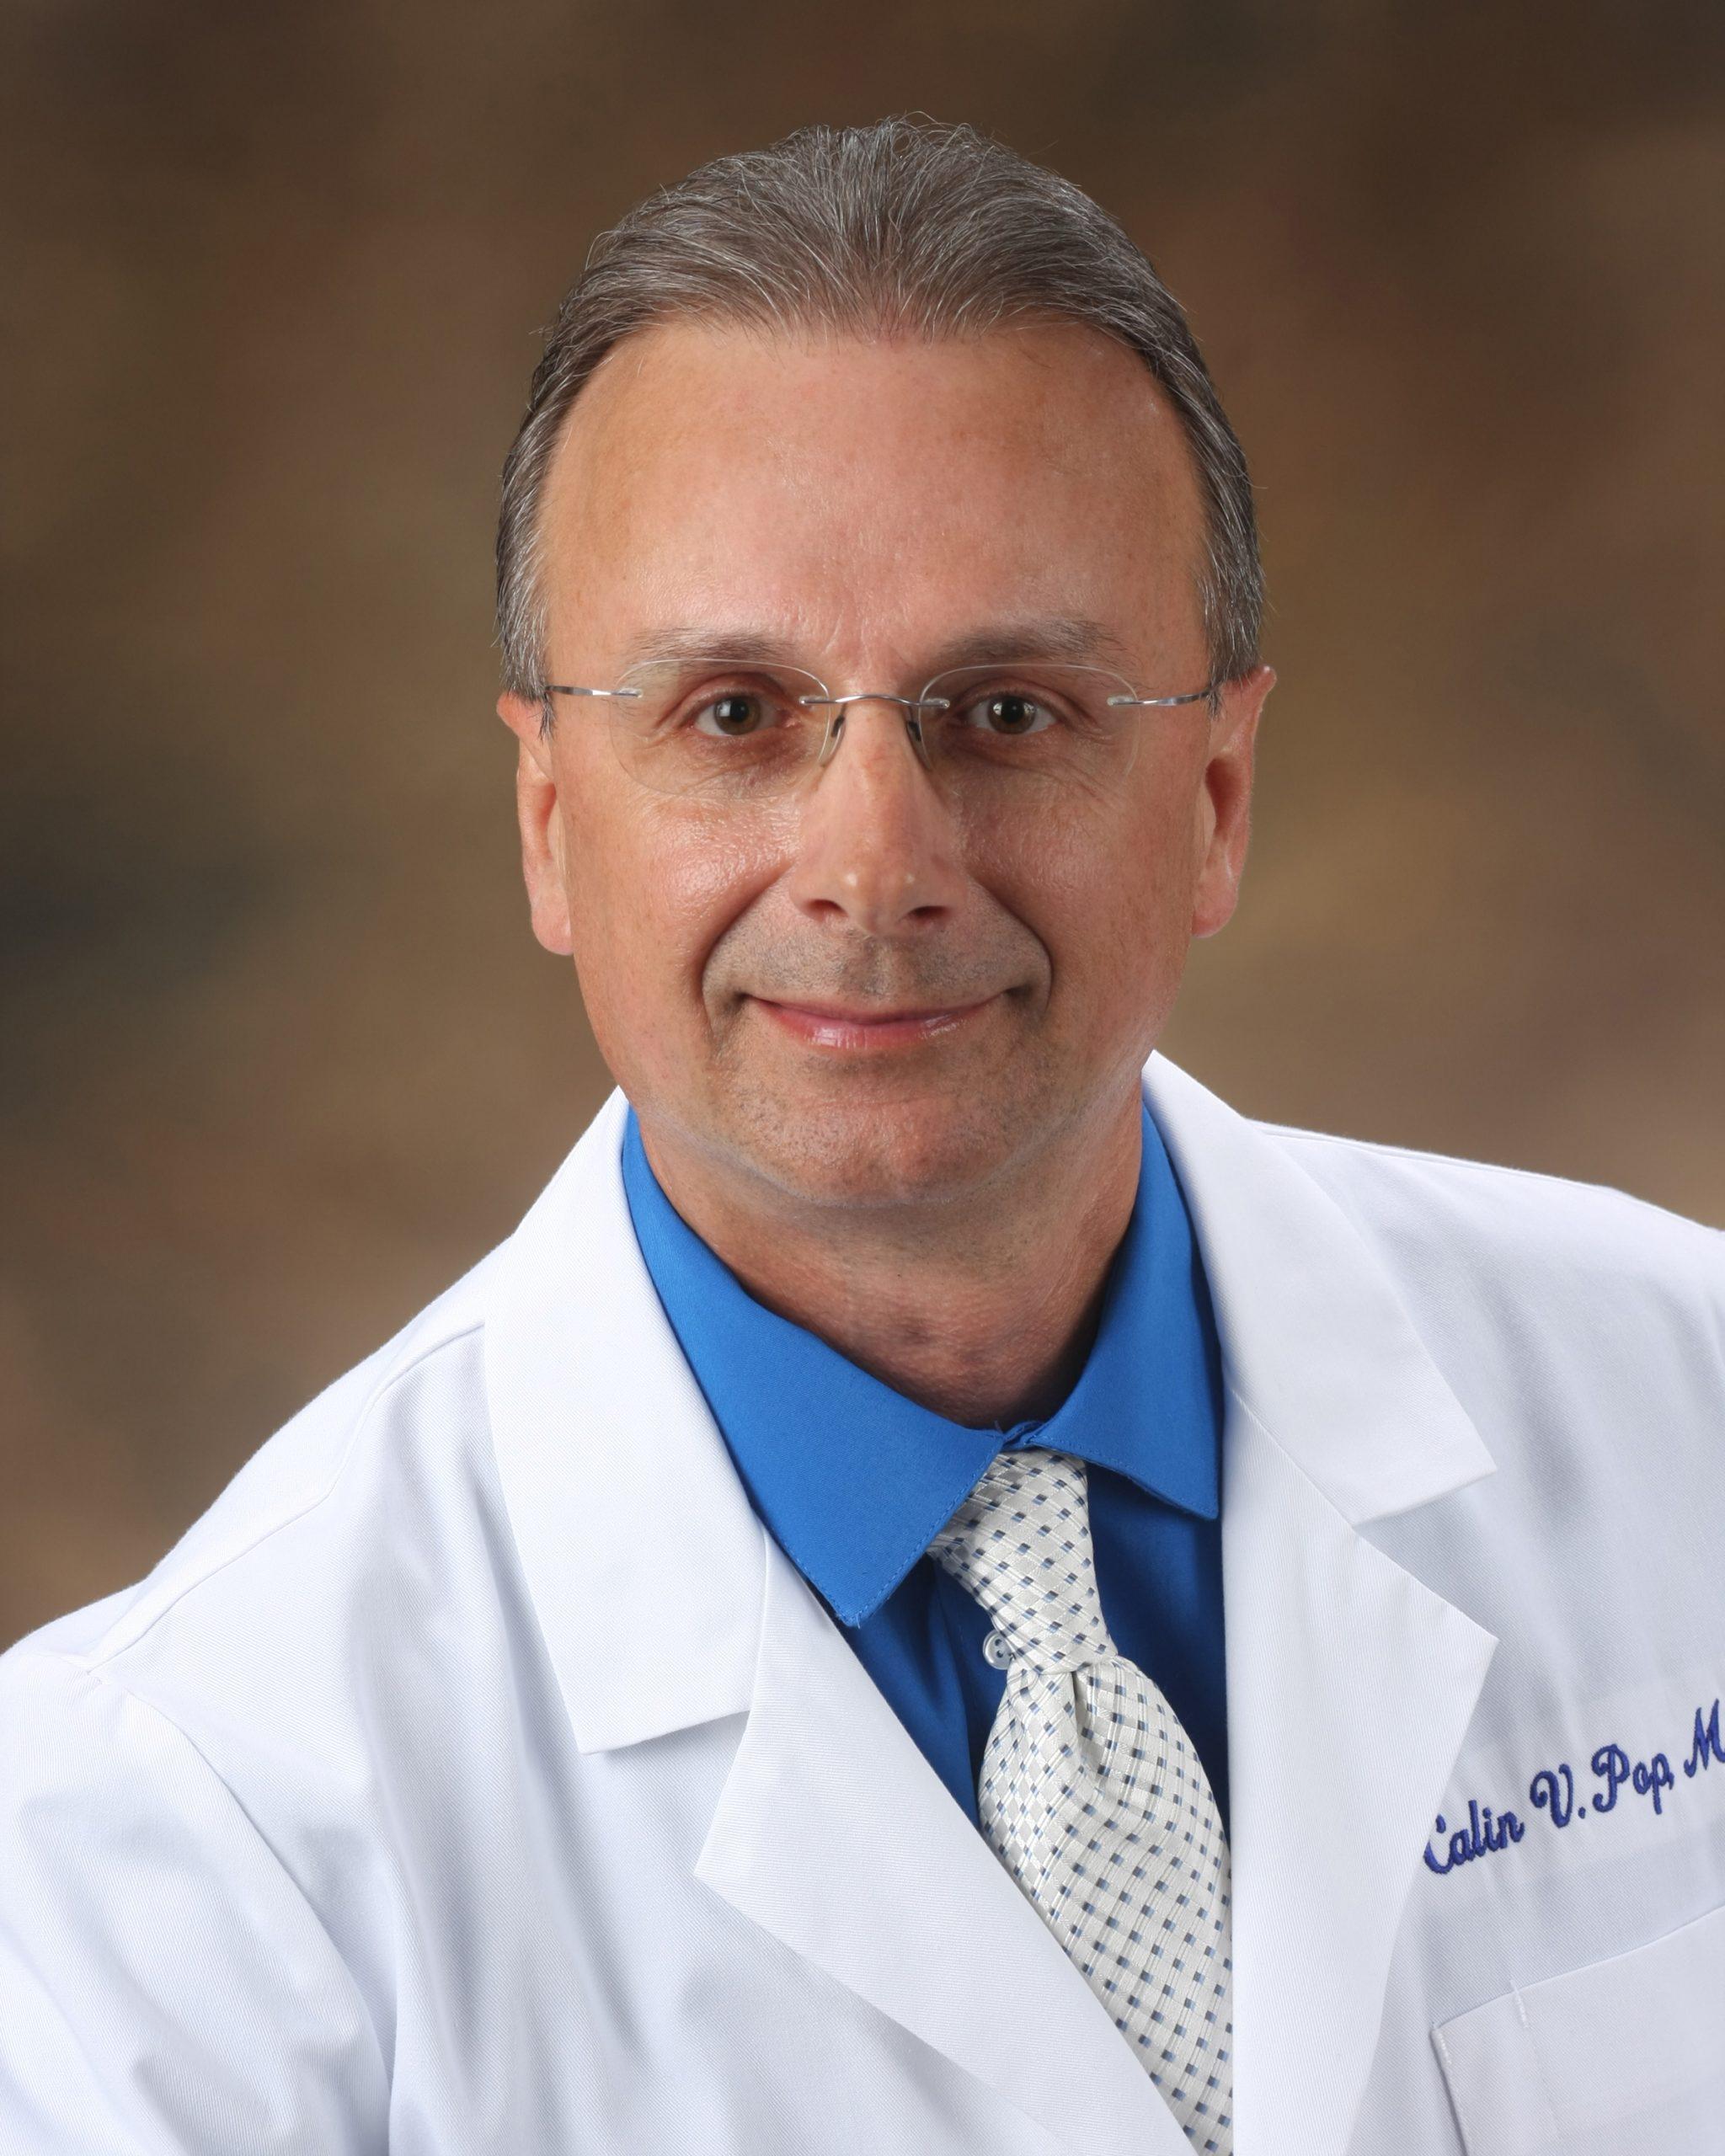 dr pop md medicine diabetes 363